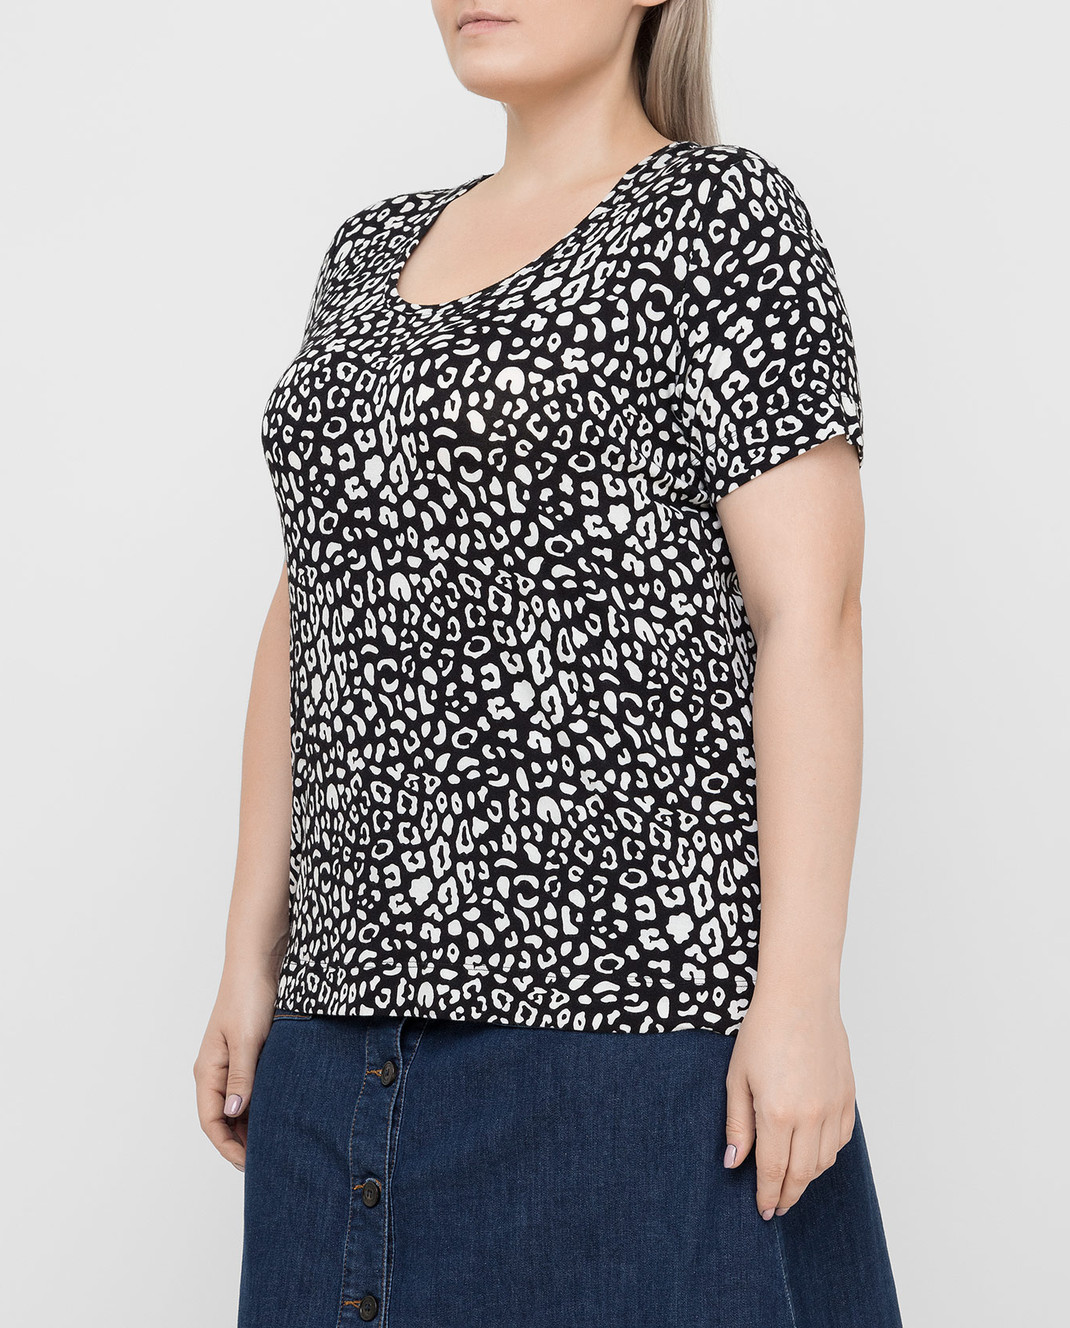 Marina Rinaldi Черная футболка изображение 3